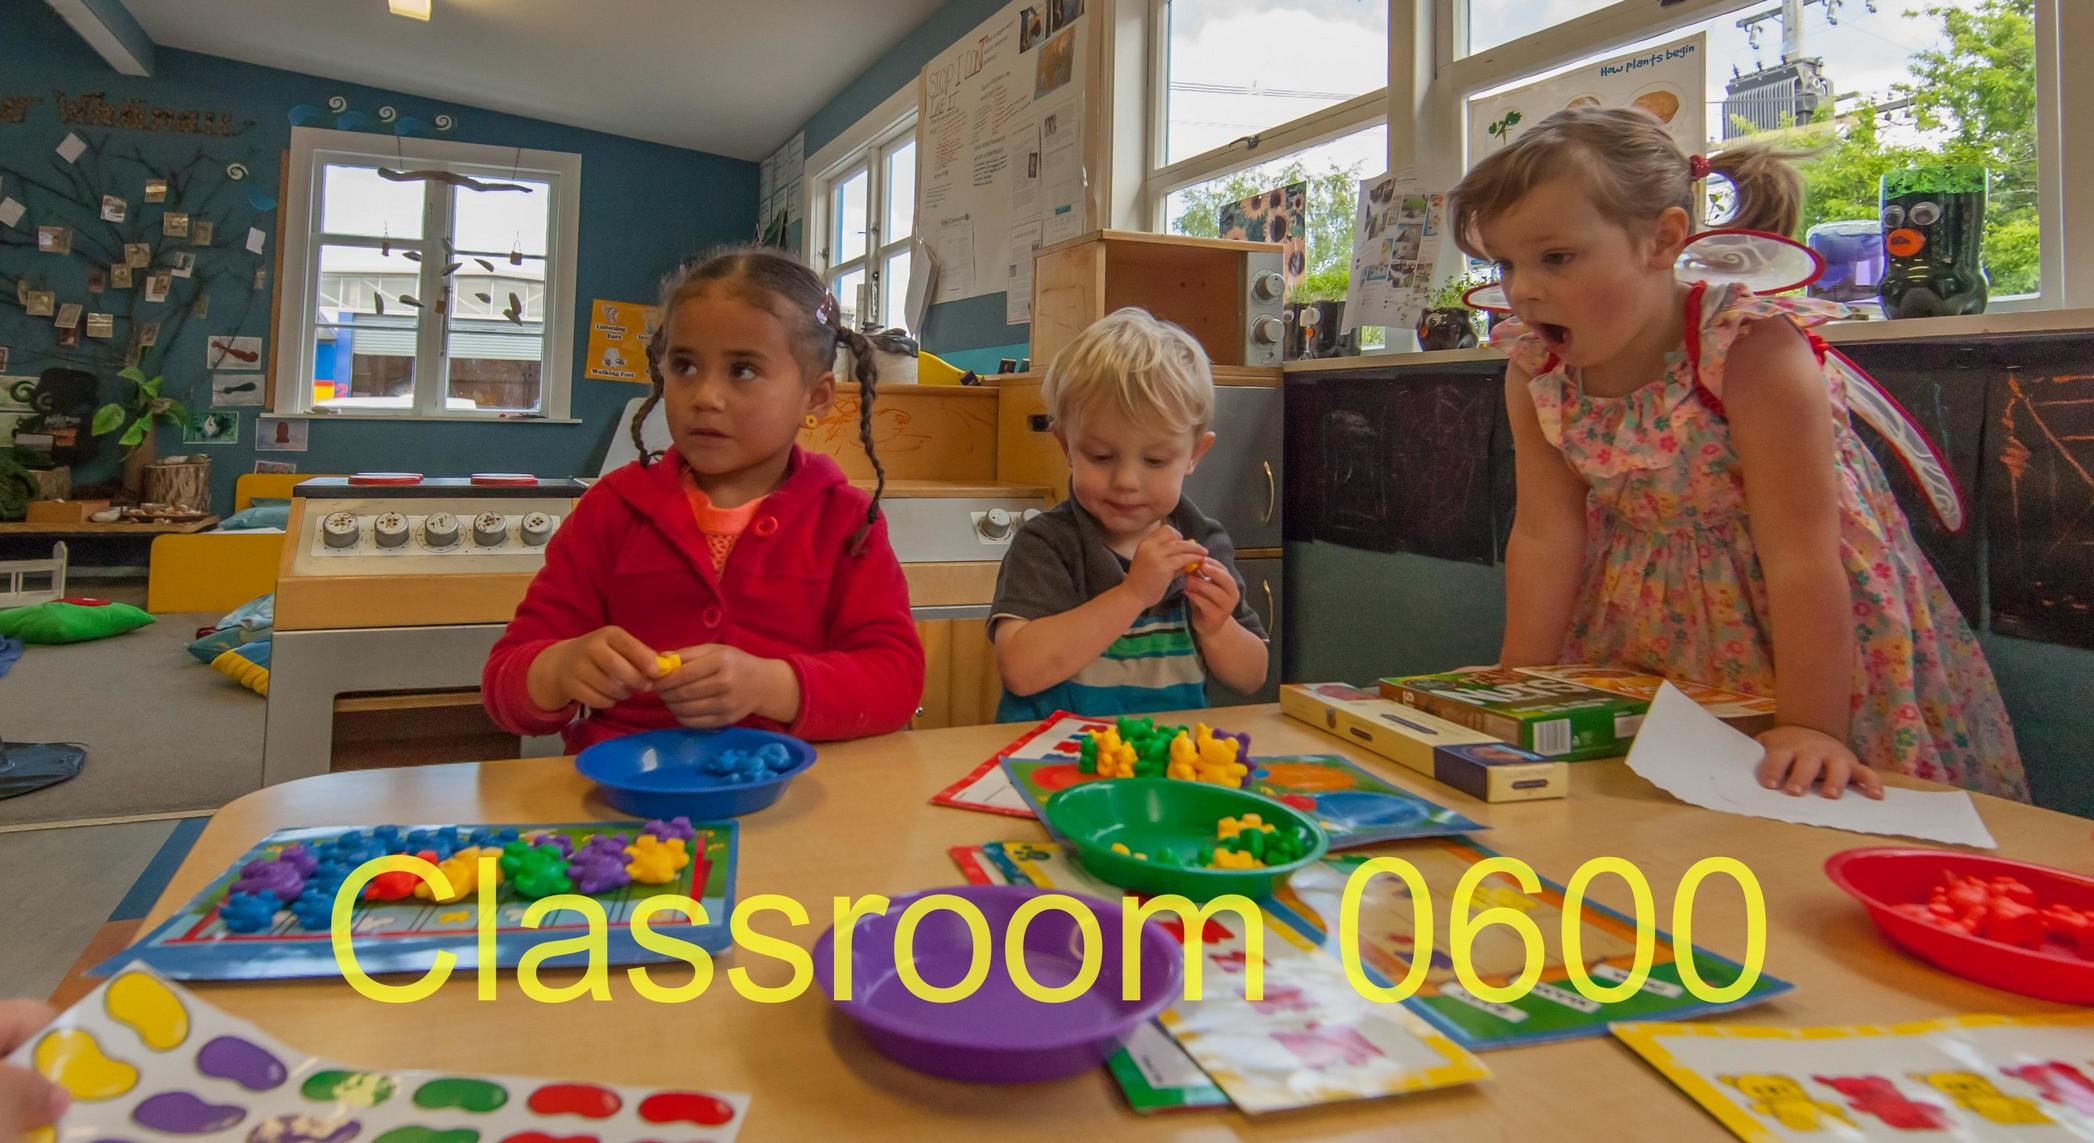 Classroom 0600